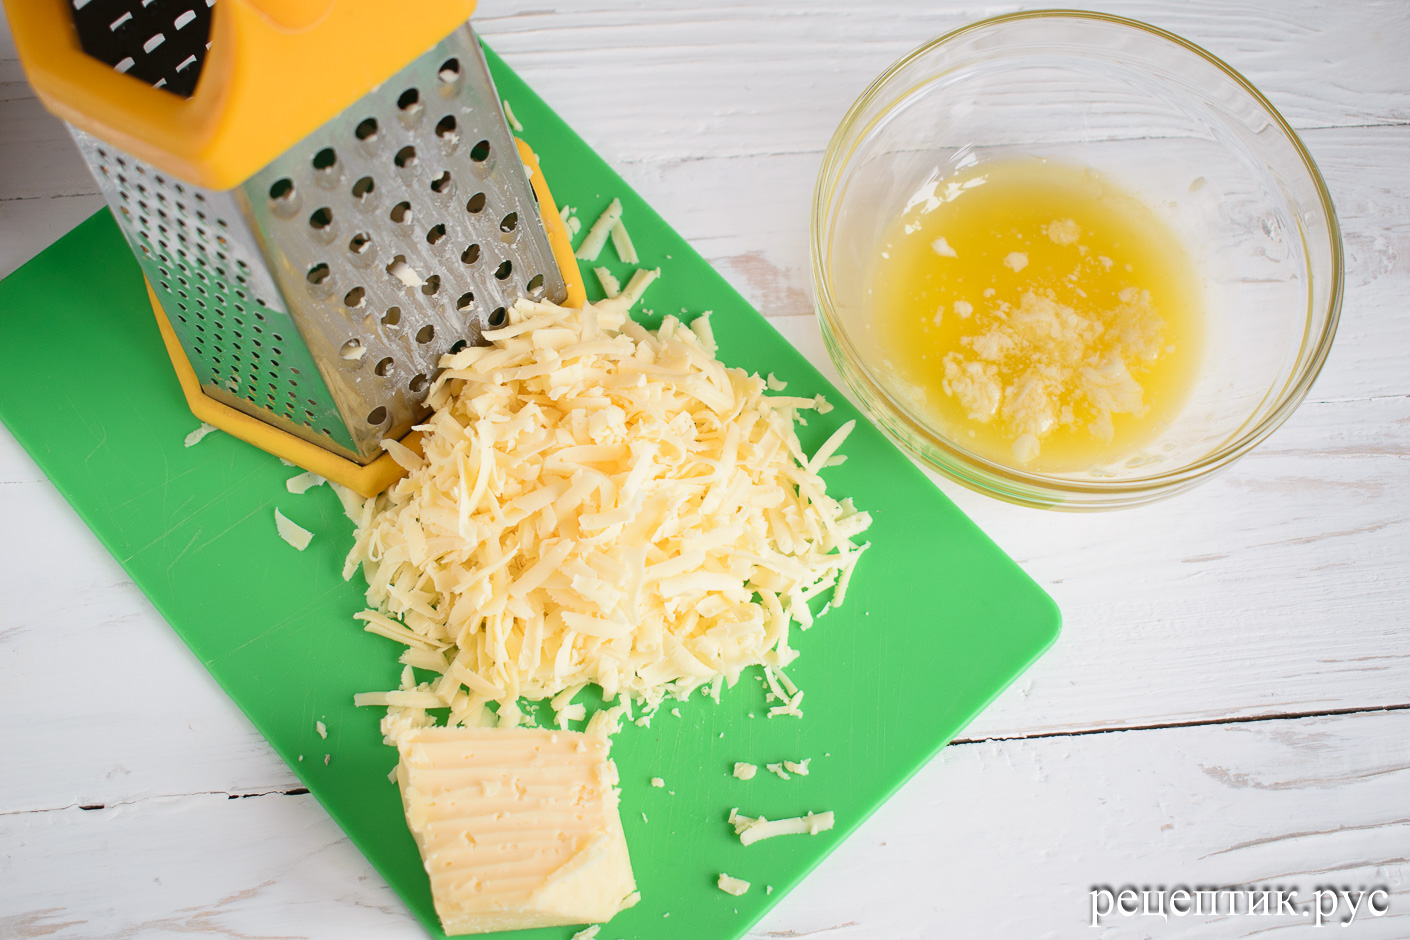 Дрожжевая булка с сыром - рецепт с фото, шаг 5